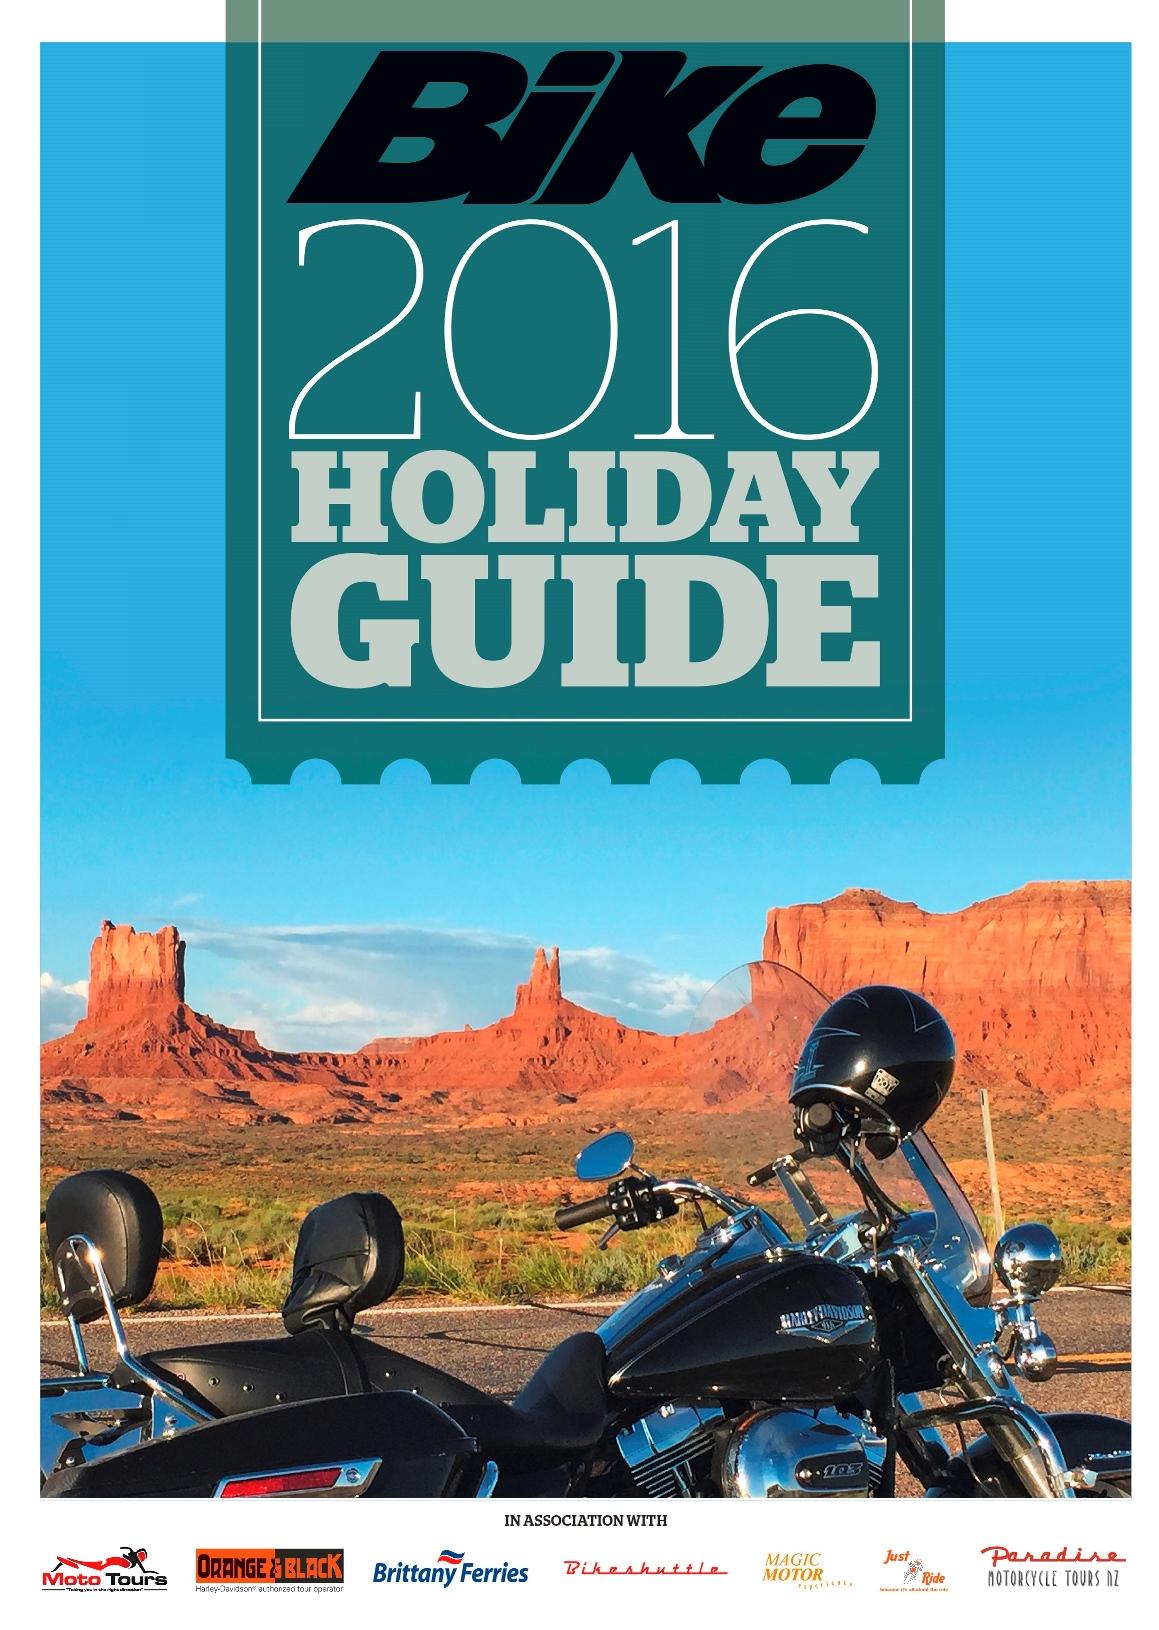 Free biking holiday guide